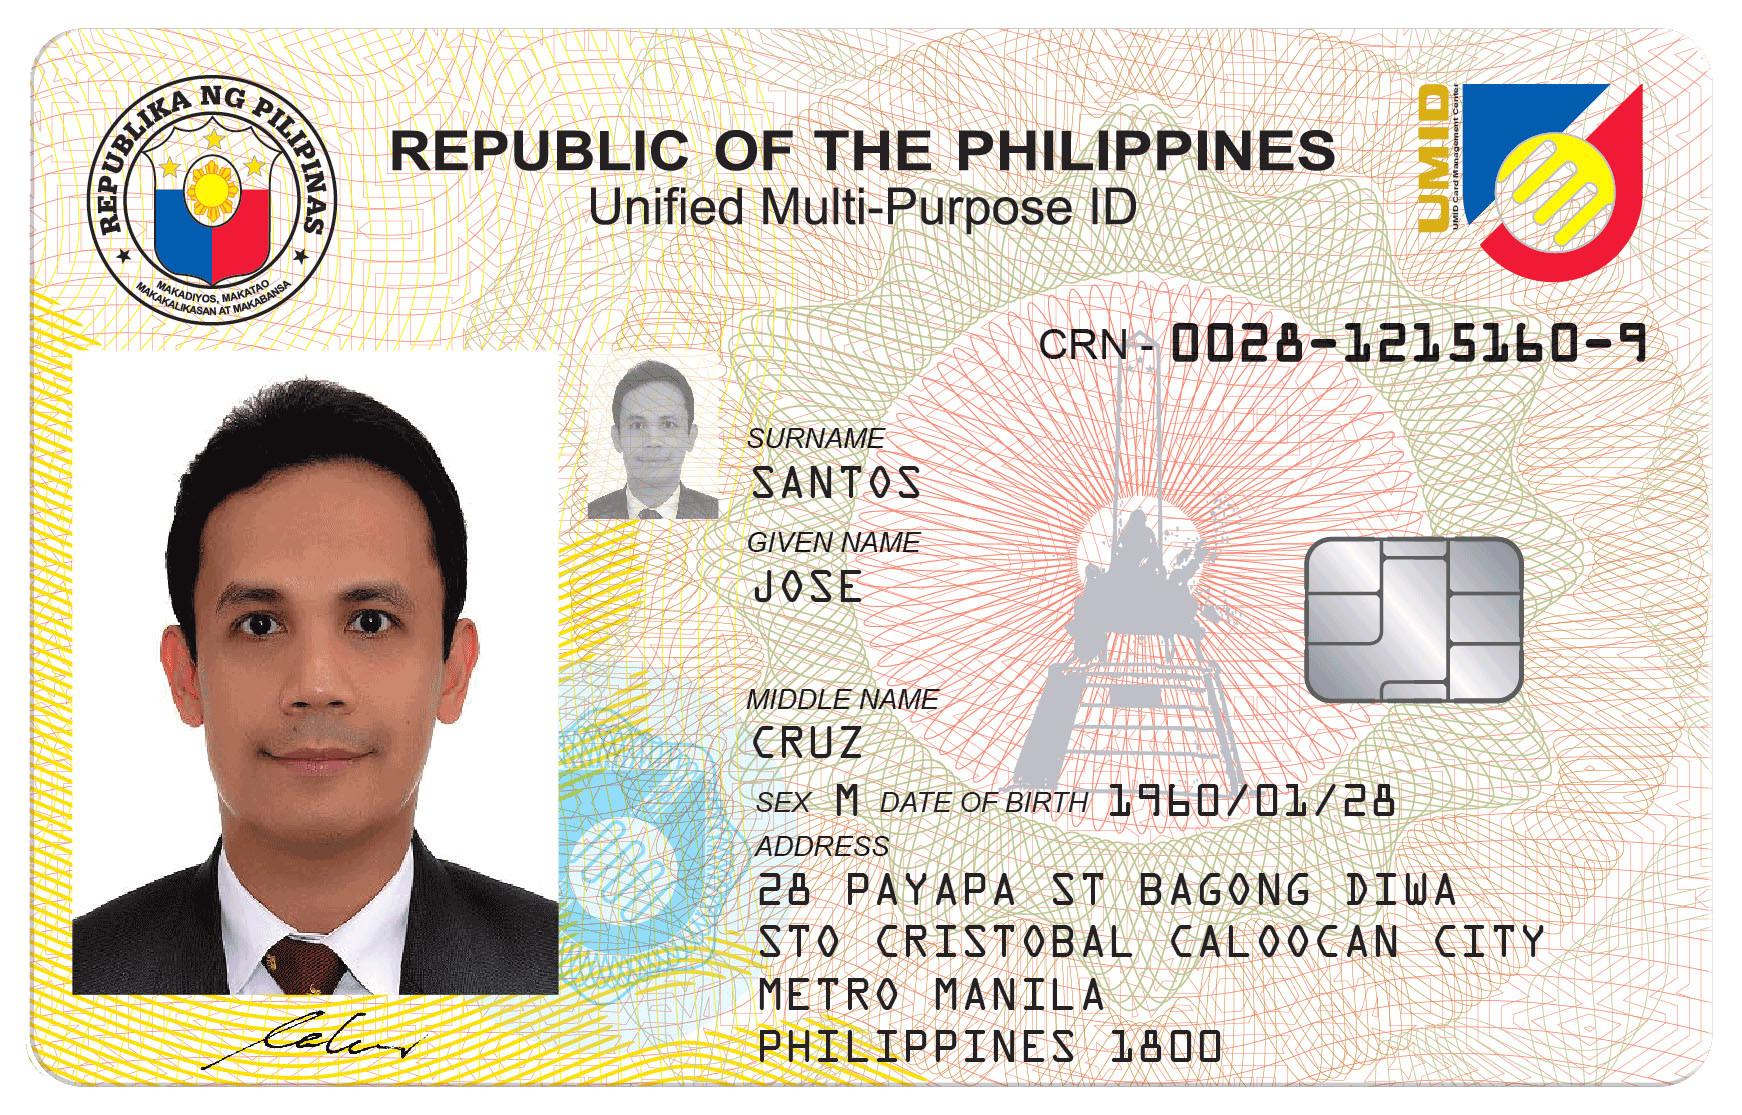 Umid Unique Medical Identity Card Unified Multi Purpose Id Wikipedia